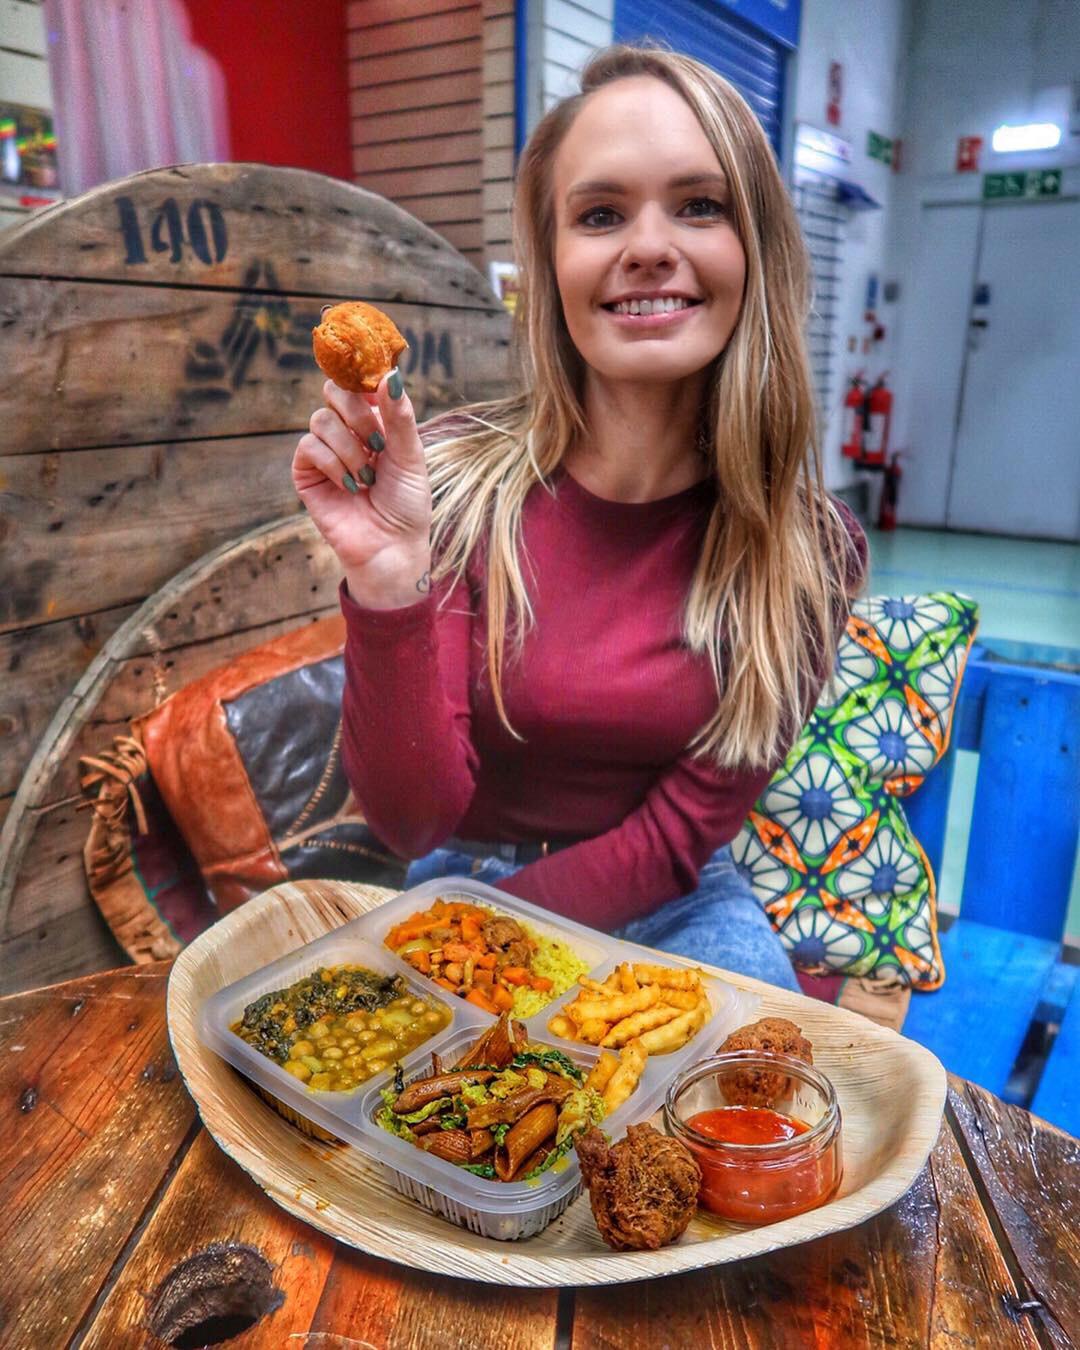 Zionly Manna Peckham The Little London Vegan